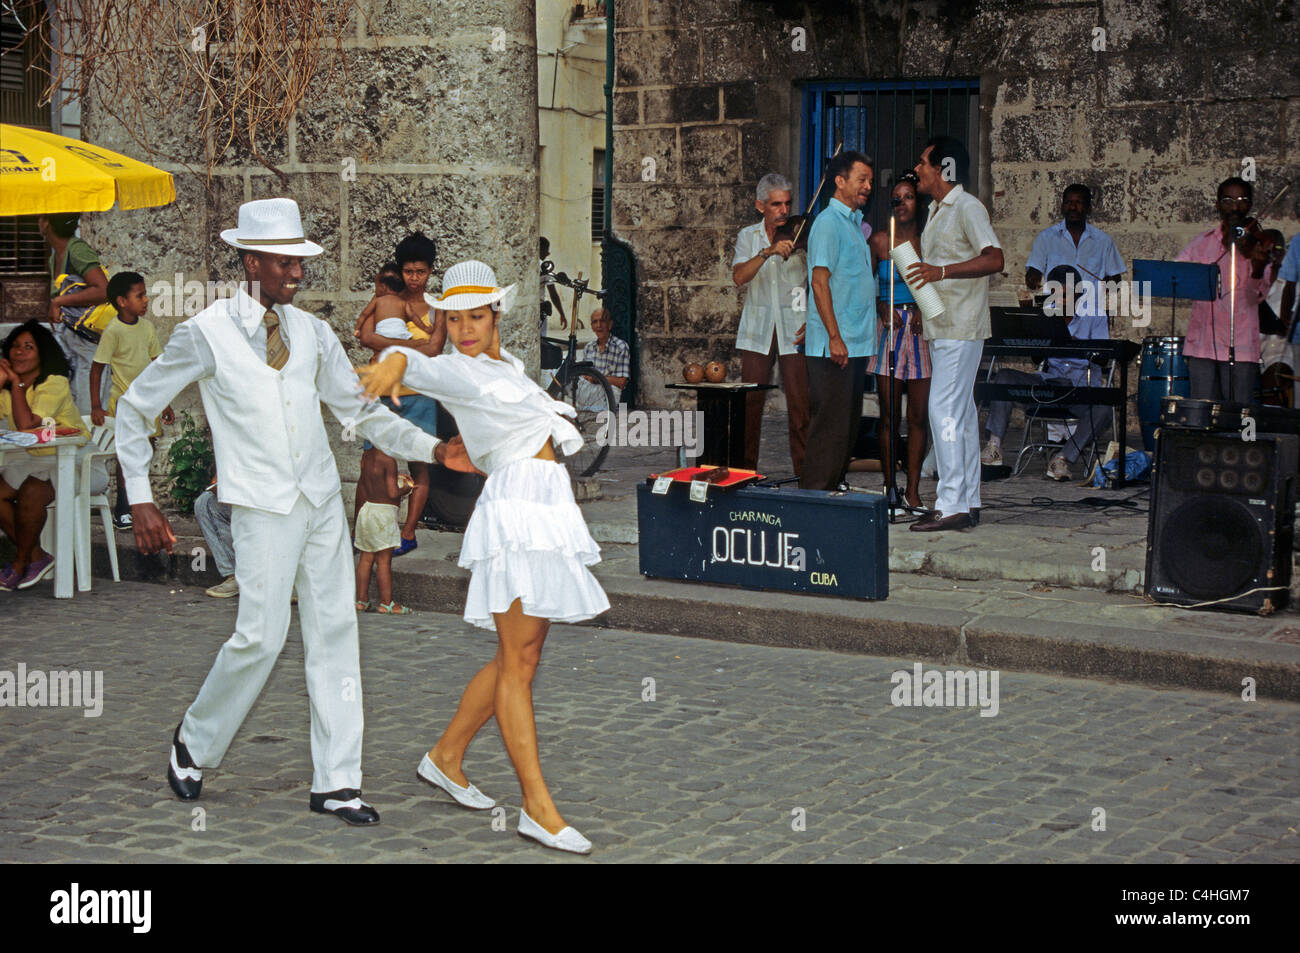 Tanzen kubanische Paar an der Plaza de la Catedral, Havanna, Kuba, Karibik Stockbild